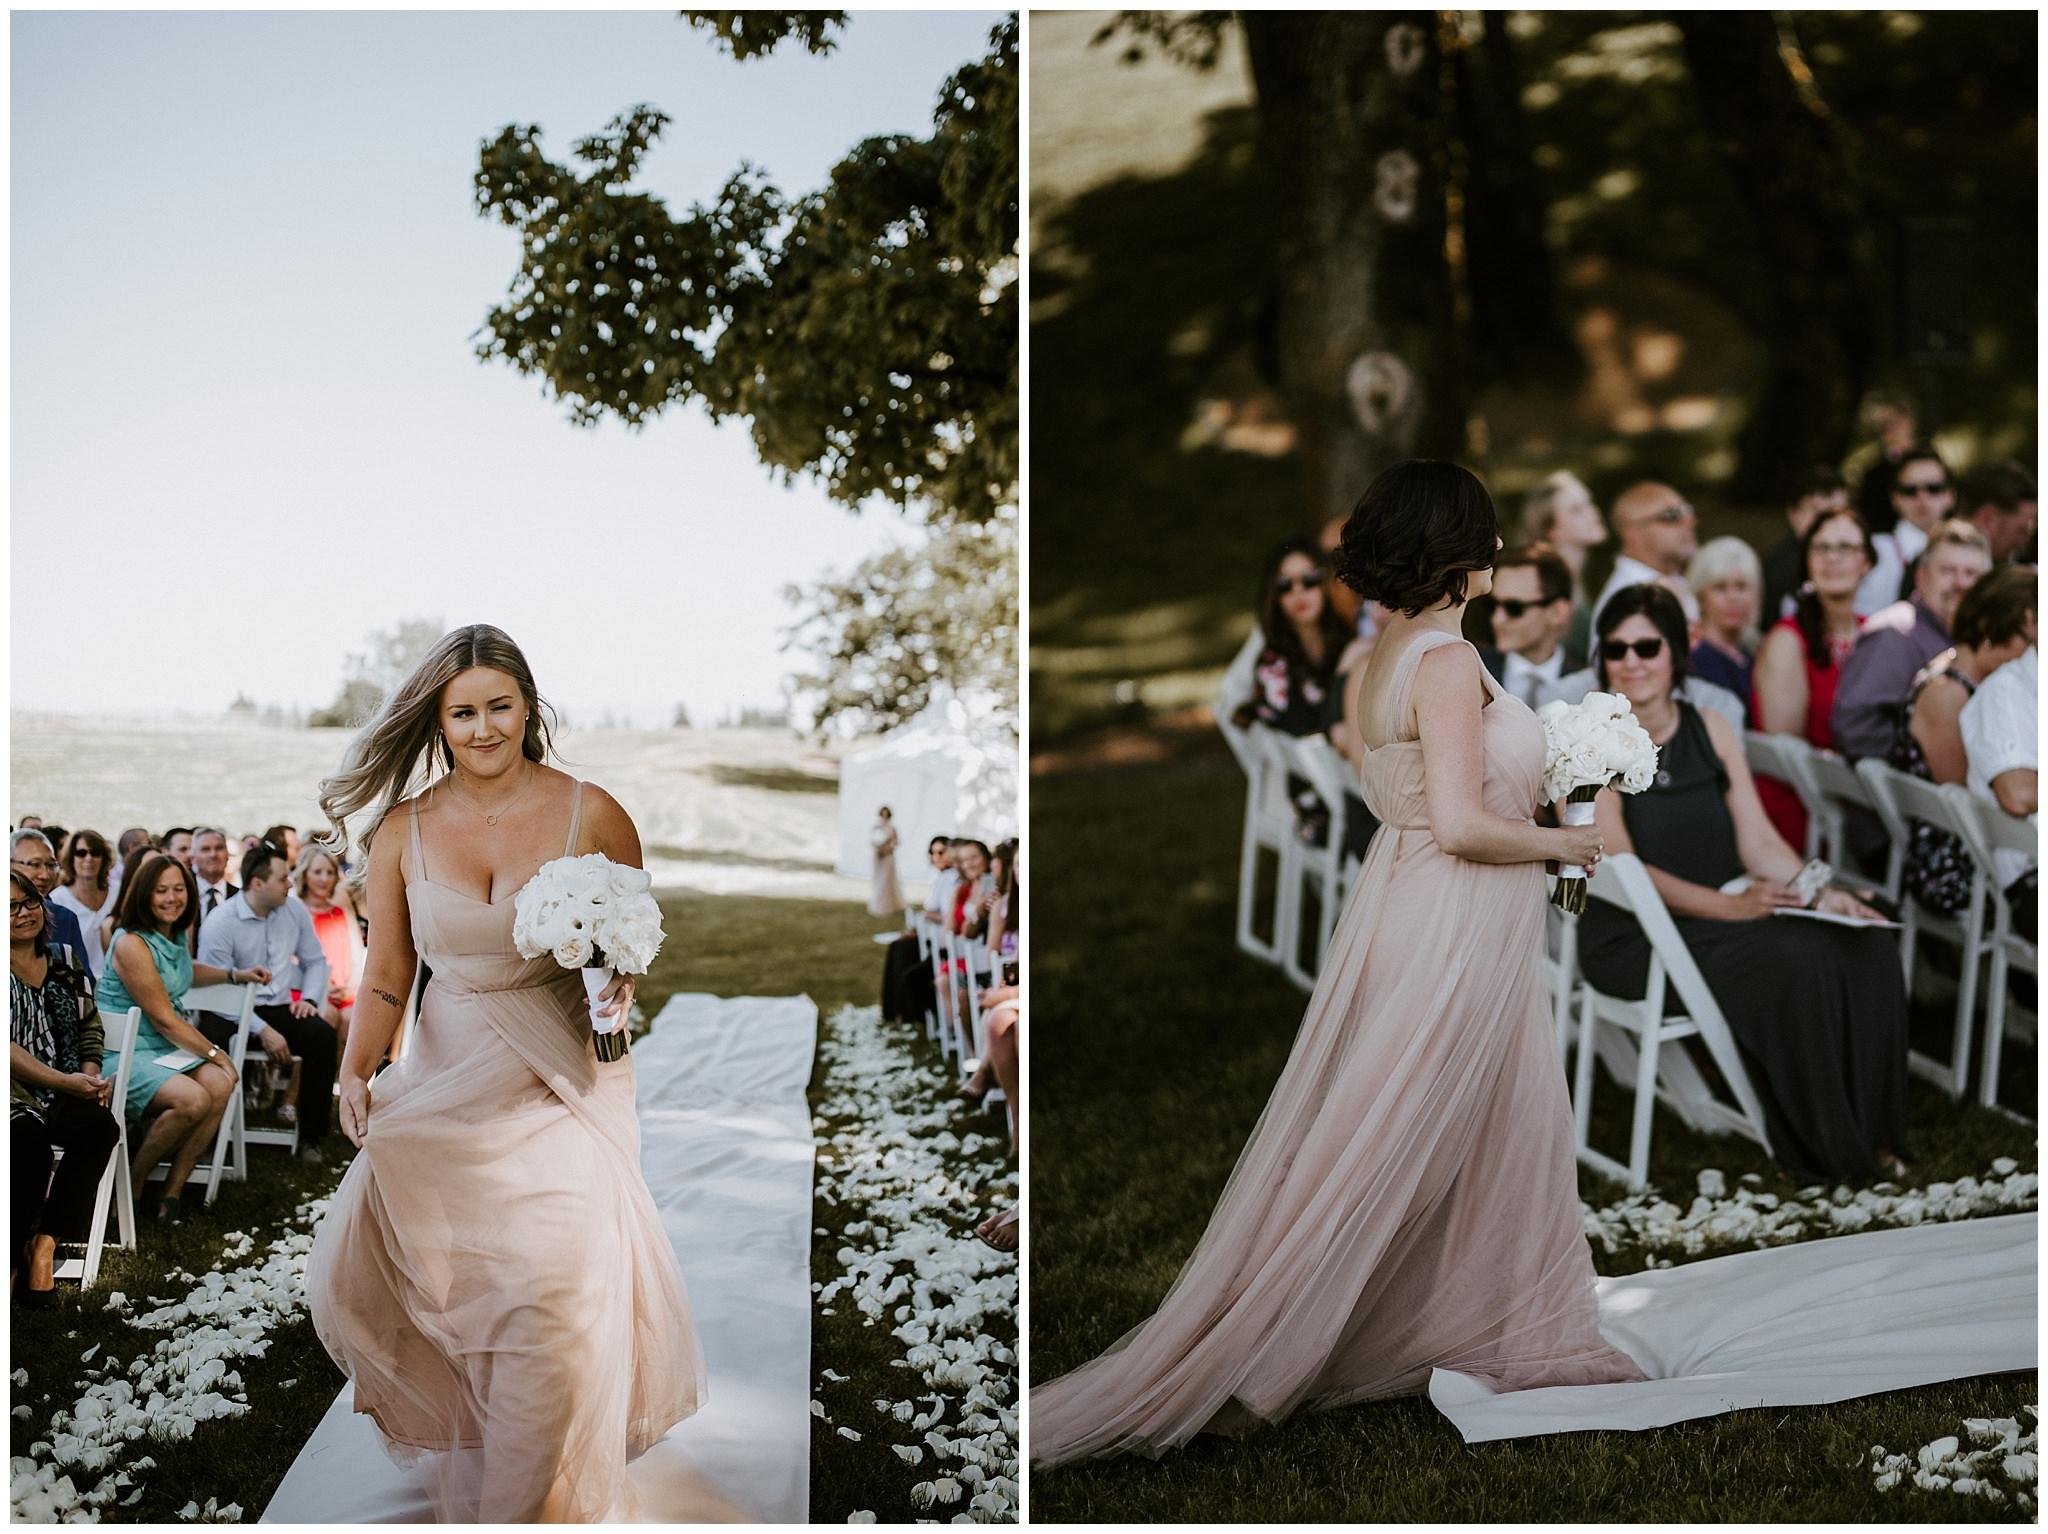 mt-lehman-winery-wedding-abbotsford-31.JPG